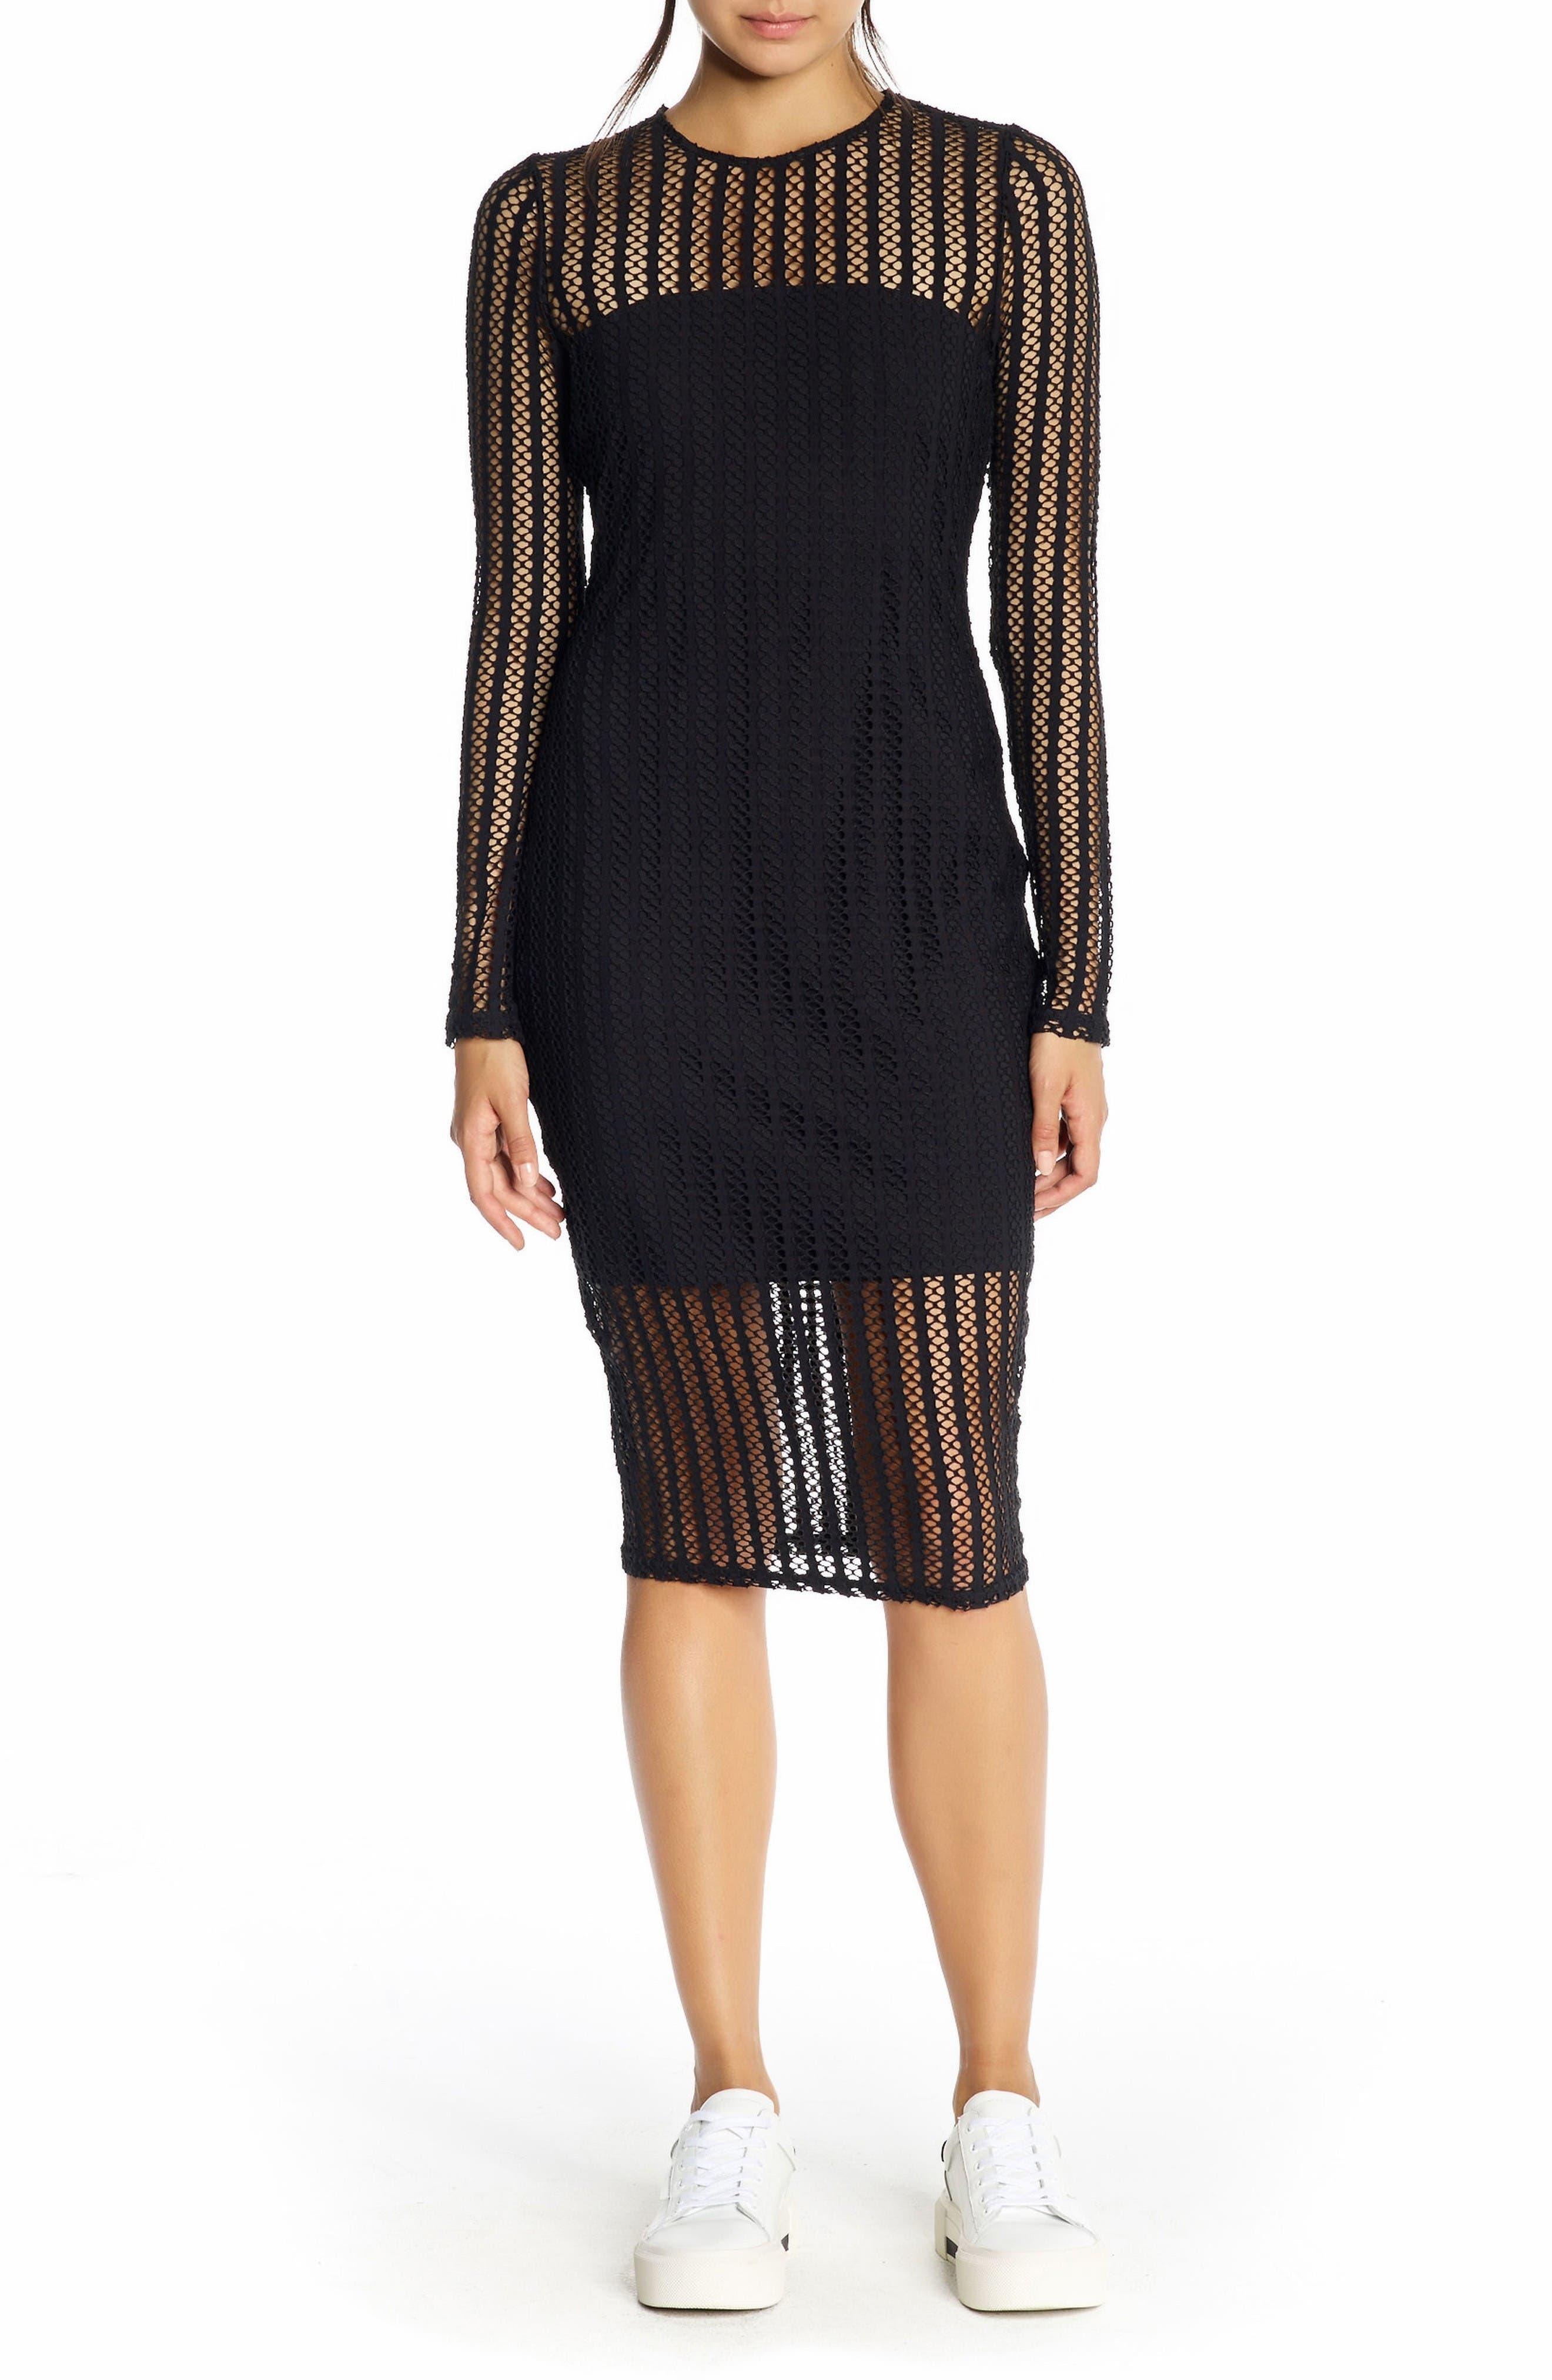 Main Image - KENDALL + KYLIE Lattice Jersey Dress